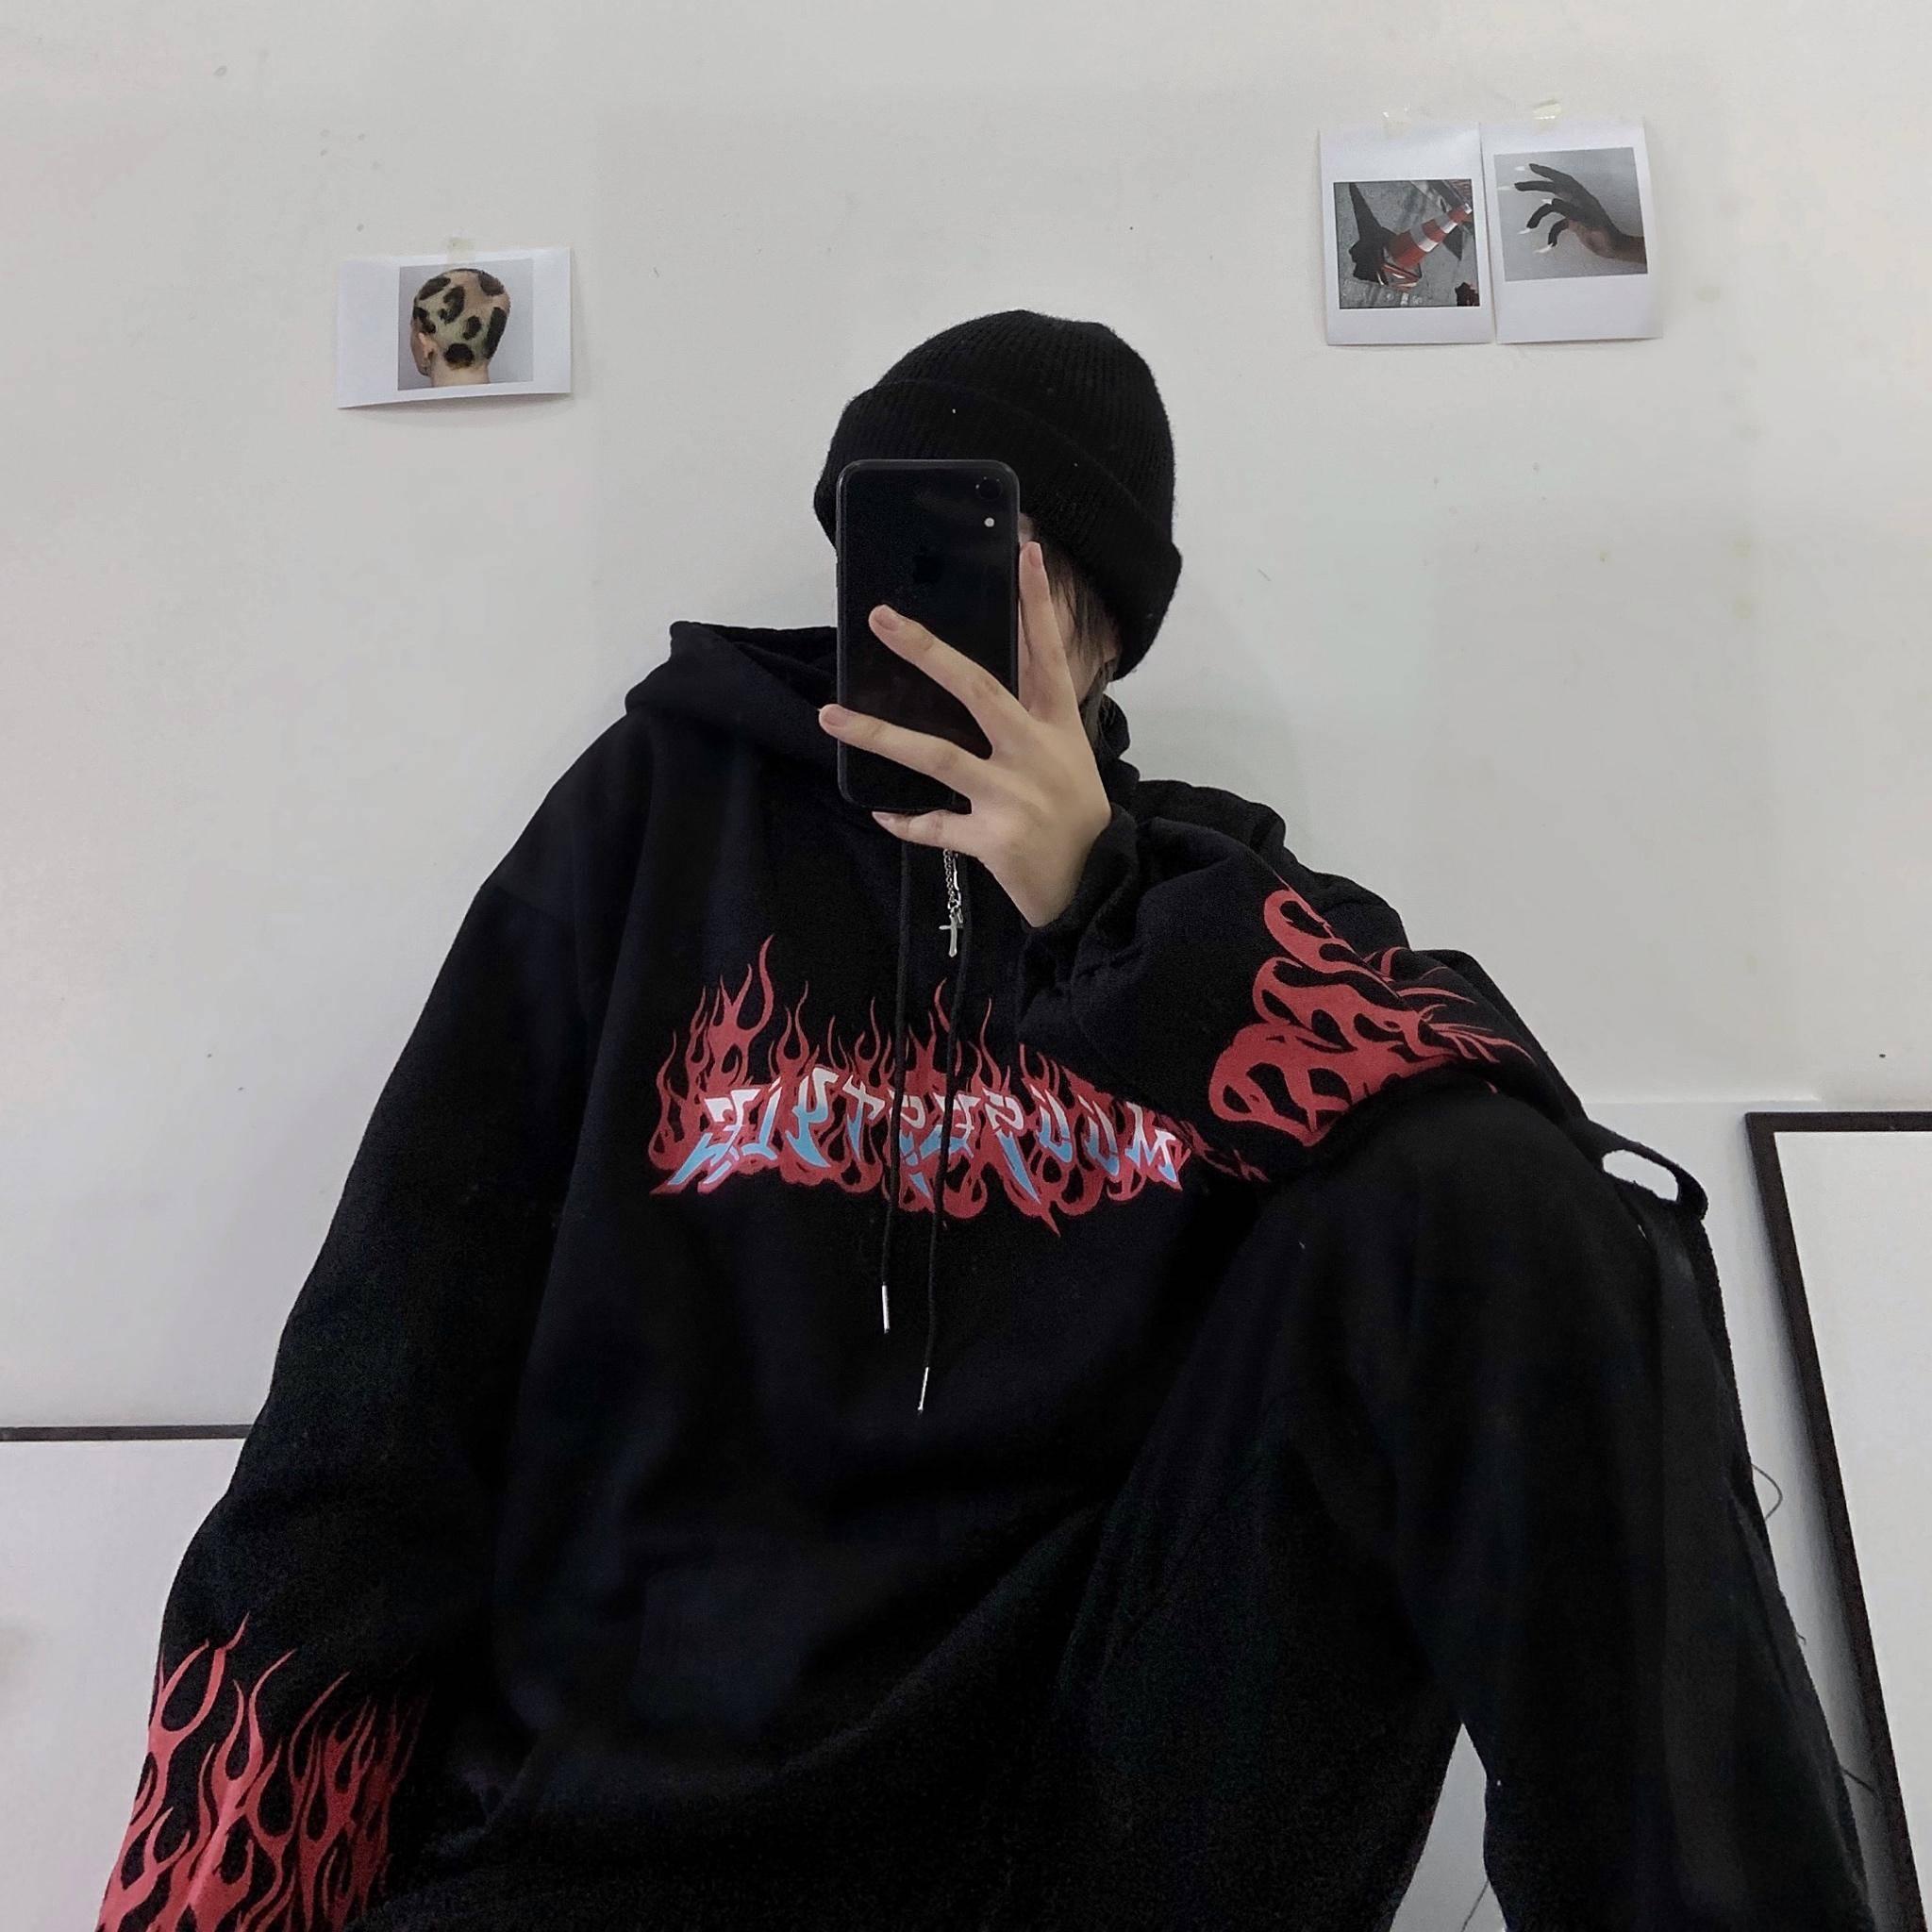 Black Autumn Fire Print Hoodies Men Women Casual Loose Hip Hop Sweatshirts Japan High Street Harajuku Hoodie Fashion Winter Tops